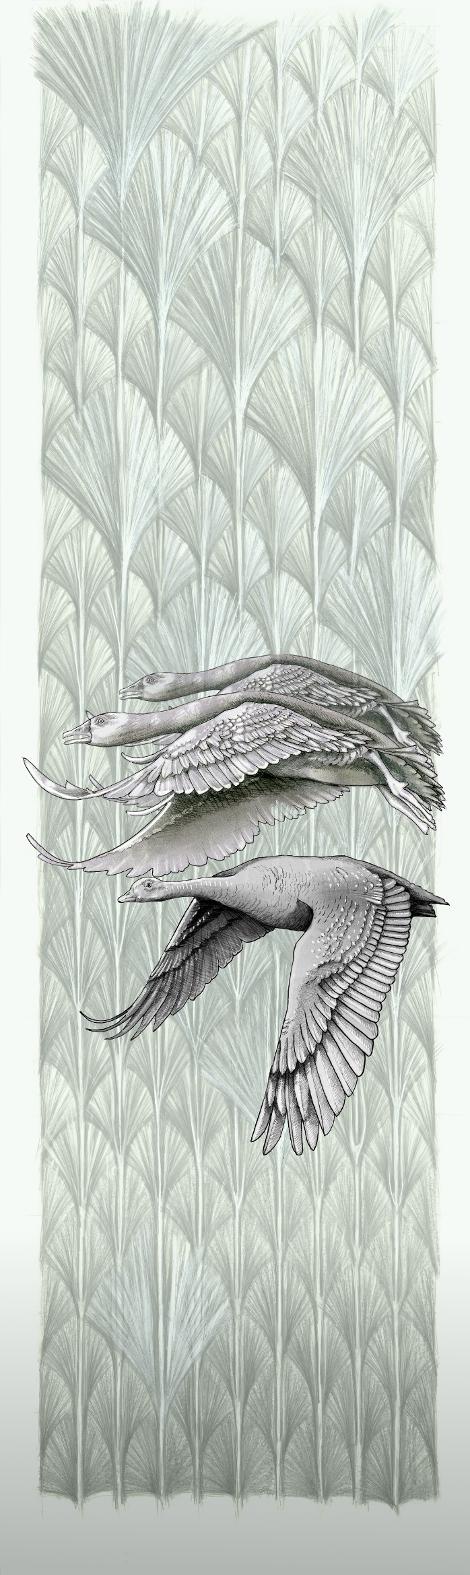 11 Geese flying R